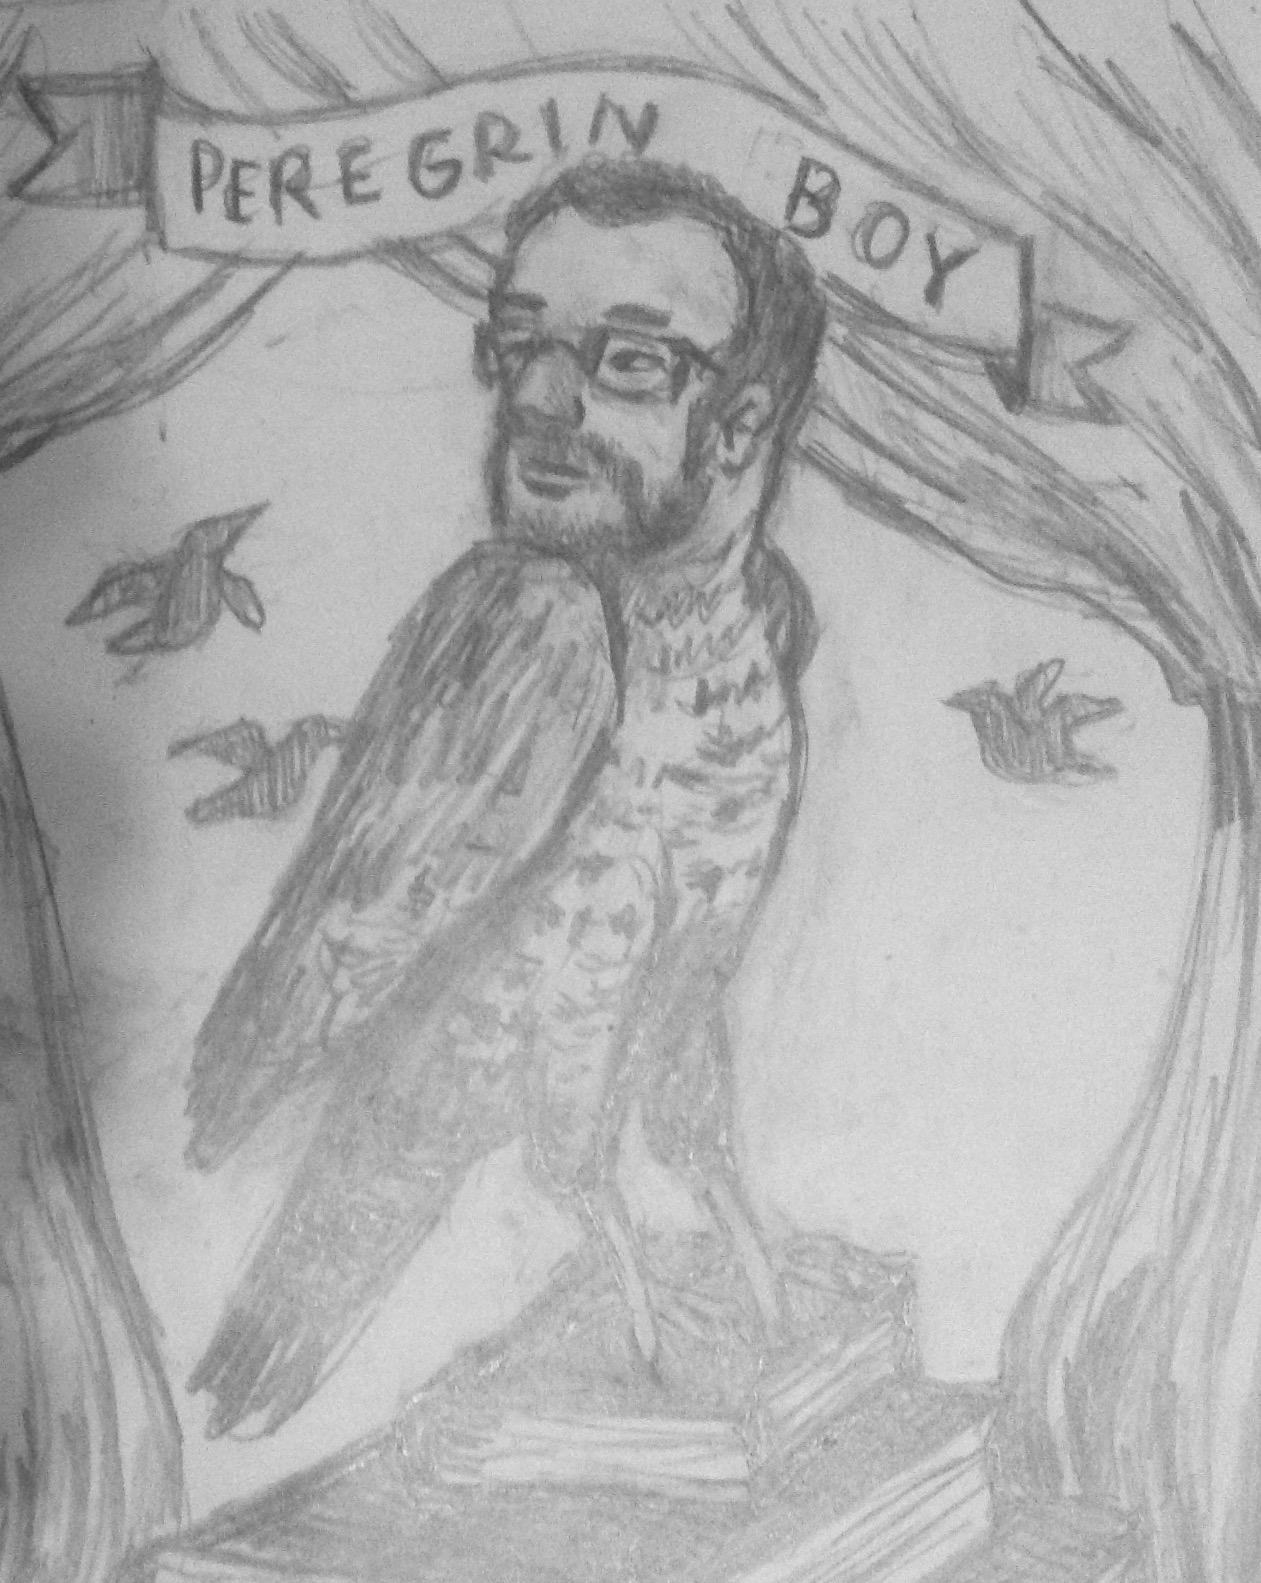 Sketch of the peregrine boy  custom magical creature .